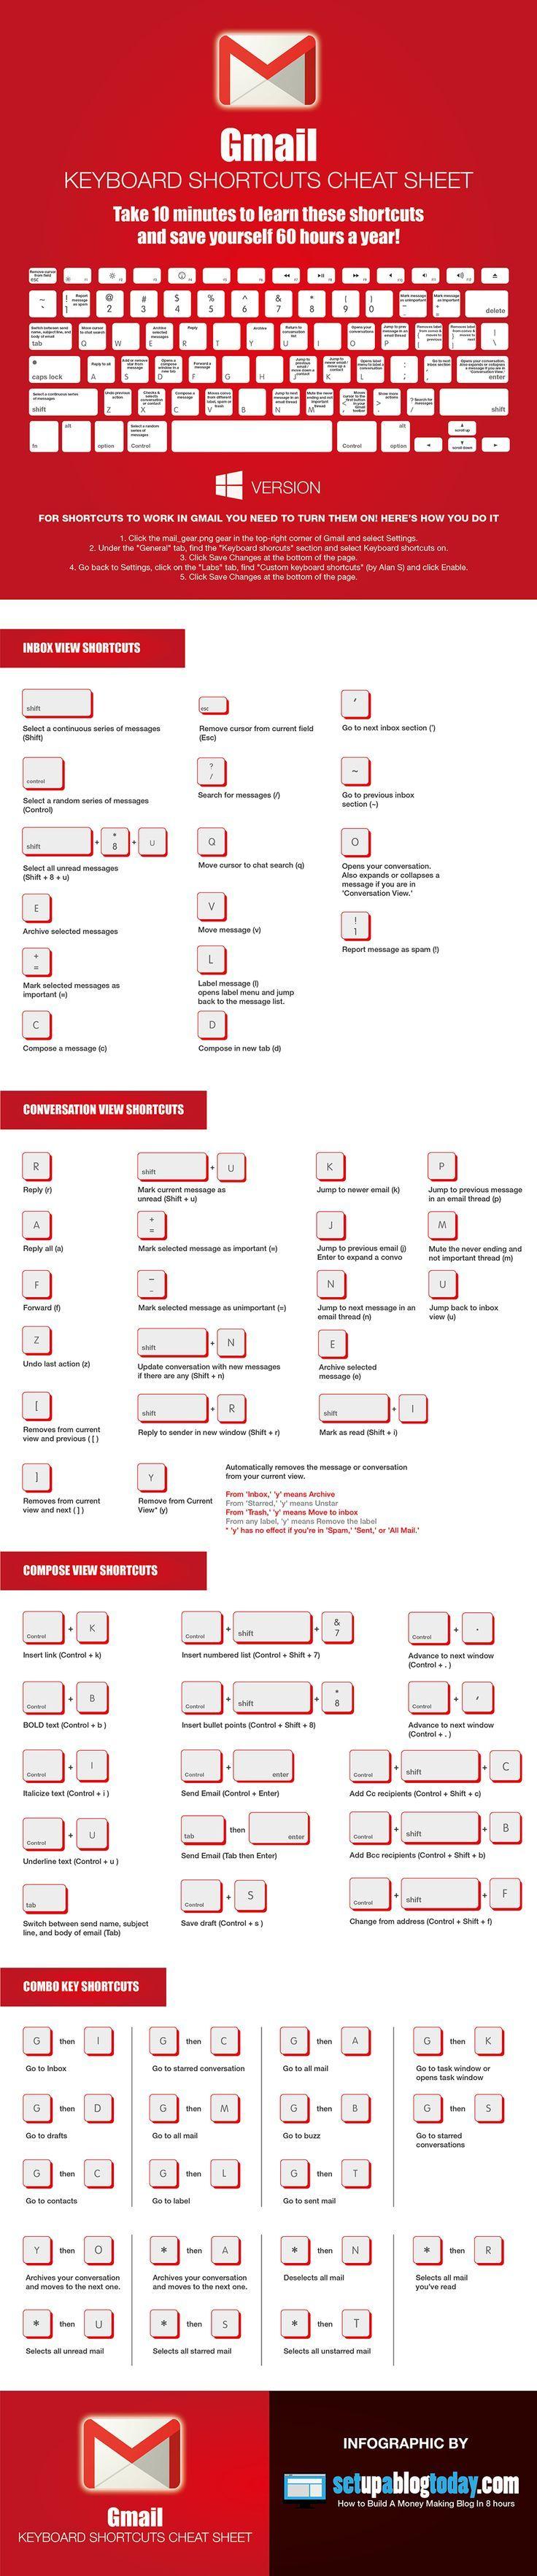 Gmail Keyboard Shortcuts Cheat Sheet #Infographic #Computer